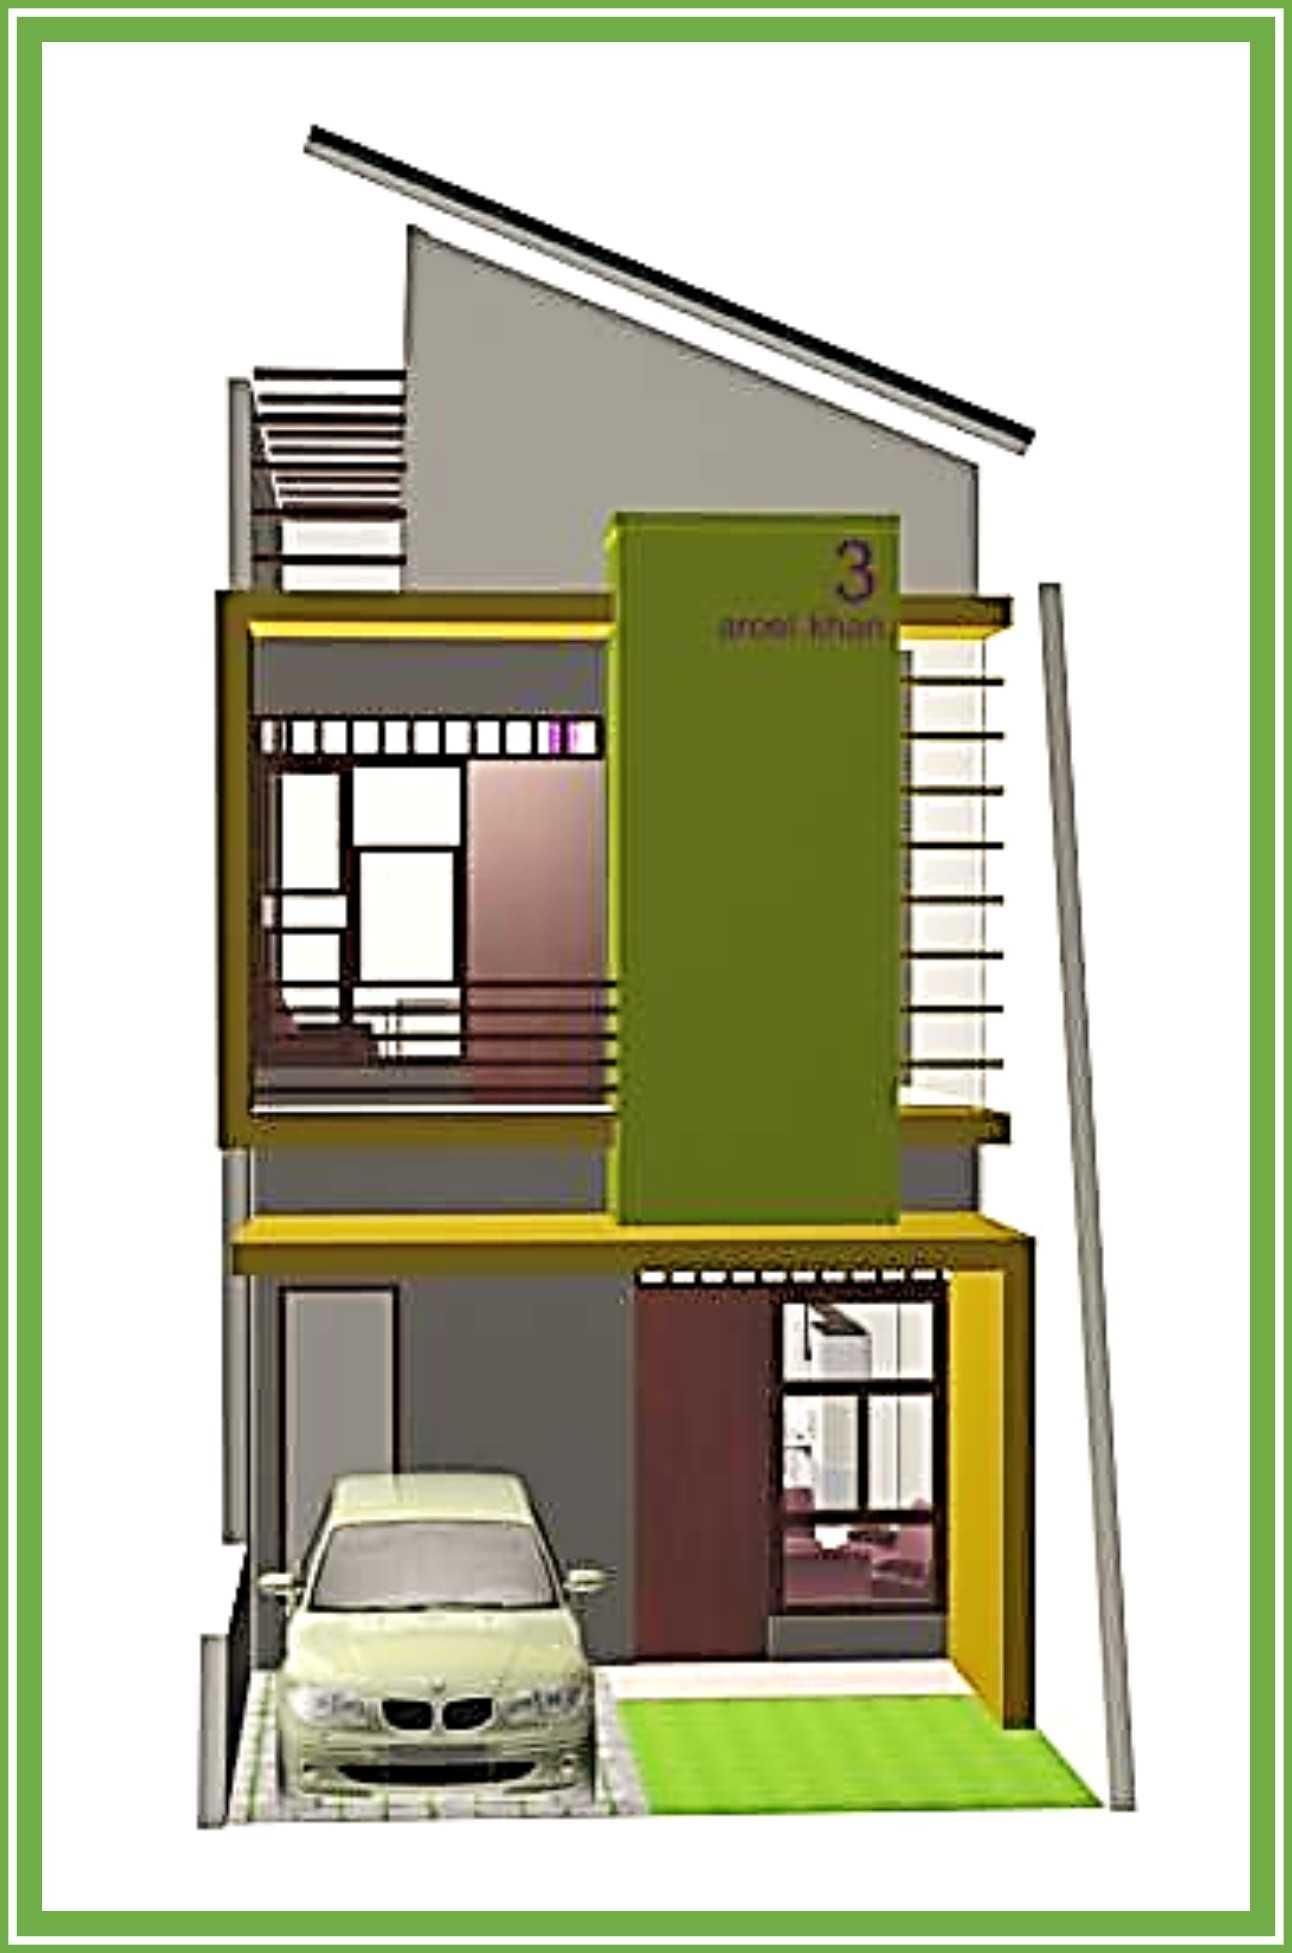 Ideall Design Renovasi Rumah 5X12 Cluster Alamanda Regency Blok L, Bekasi Utara Jl. Pd. Ungu Permai, Bahagia, Kec. Babelan, Kota Bks, Jawa Barat 17125, Indonesia Jl. Pd. Ungu Permai, Bahagia, Kec. Babelan, Kota Bks, Jawa Barat 17125, Indonesia Ideall-Design-When-A-Design-Idea-Becomes-Ideal-Design-For-All-Renovasi-Rumah-5X12  114416